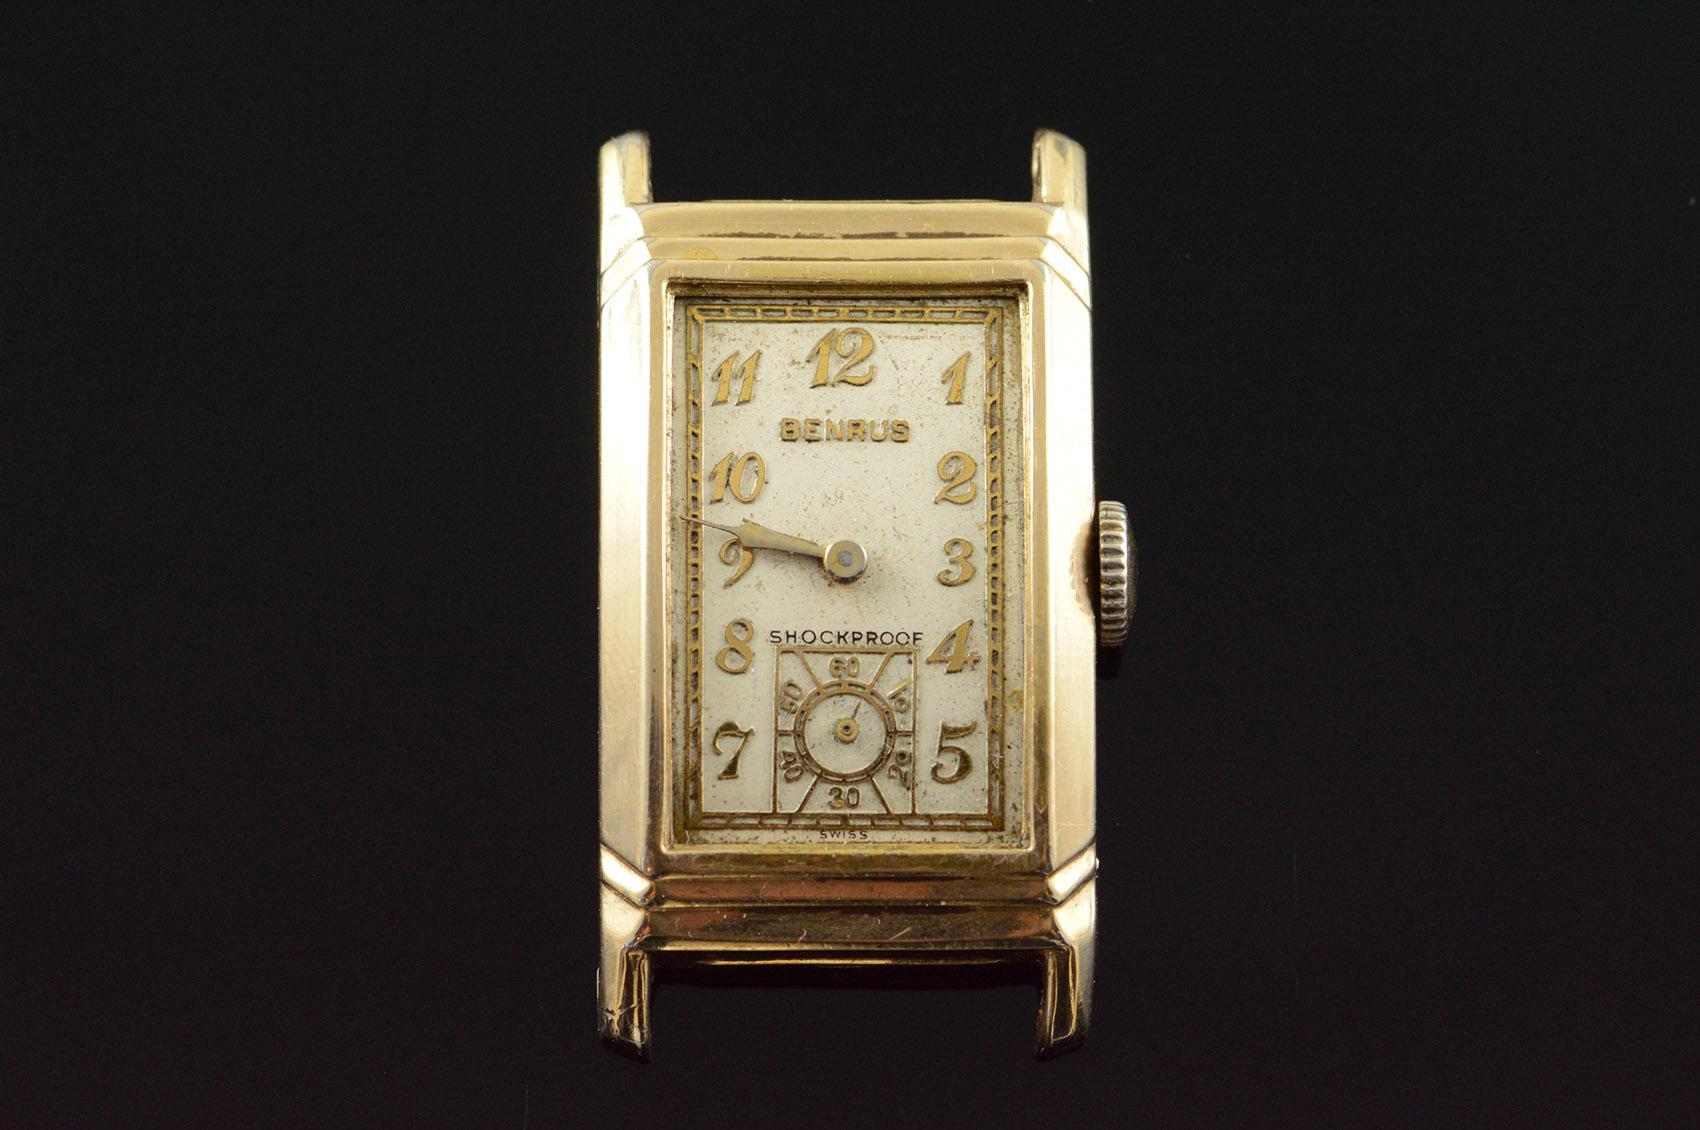 Benrus Shockproof Vintage Square 20x40mm Wrist Watch Men